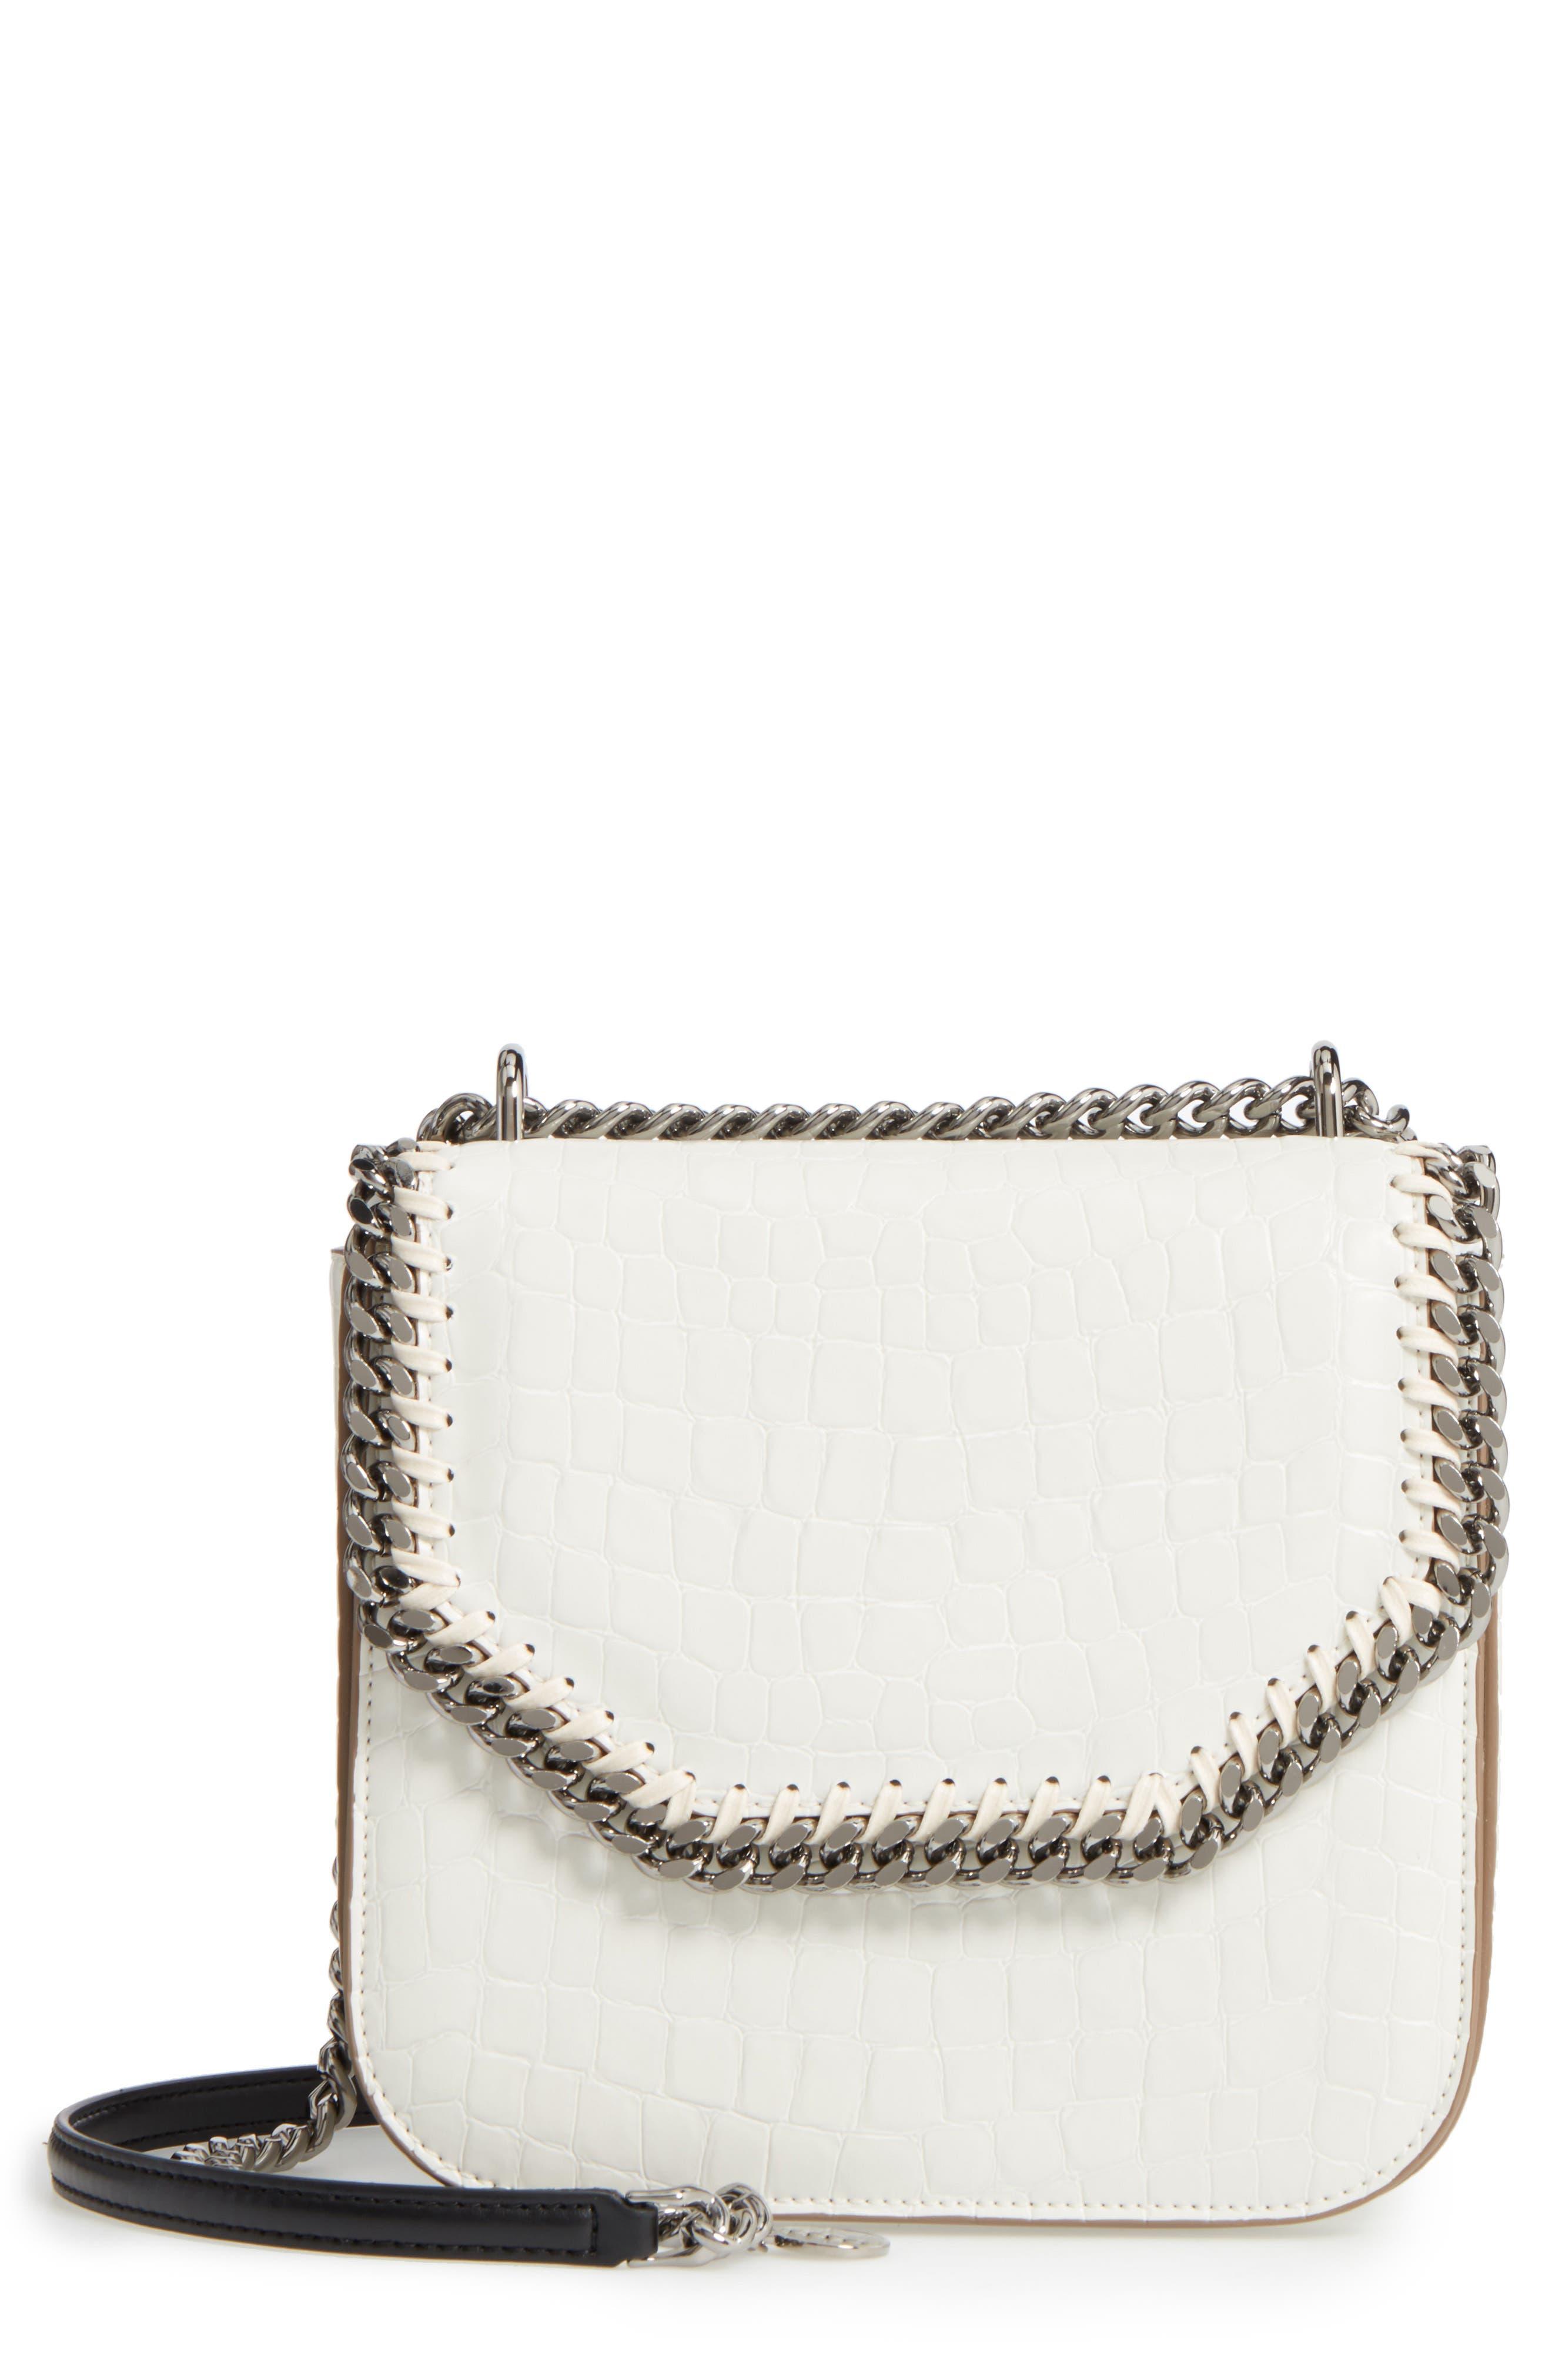 Medium Falabella Box Croc-Embossed Faux Leather Shoulder Bag,                             Main thumbnail 1, color,                             102